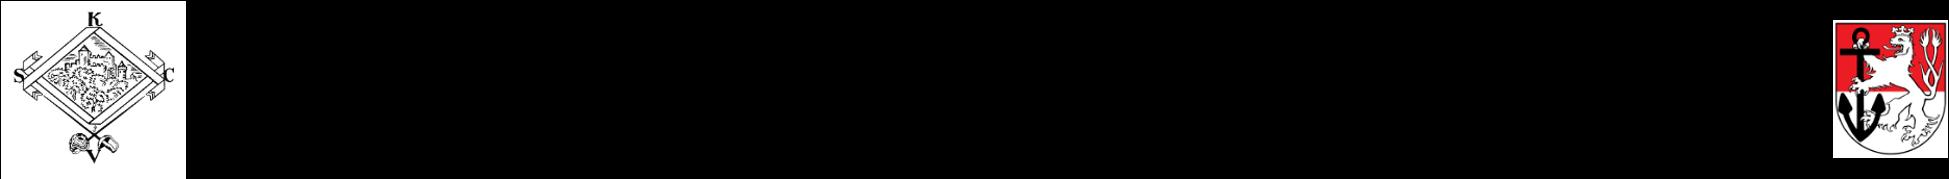 AHSC zu Düsseldorf